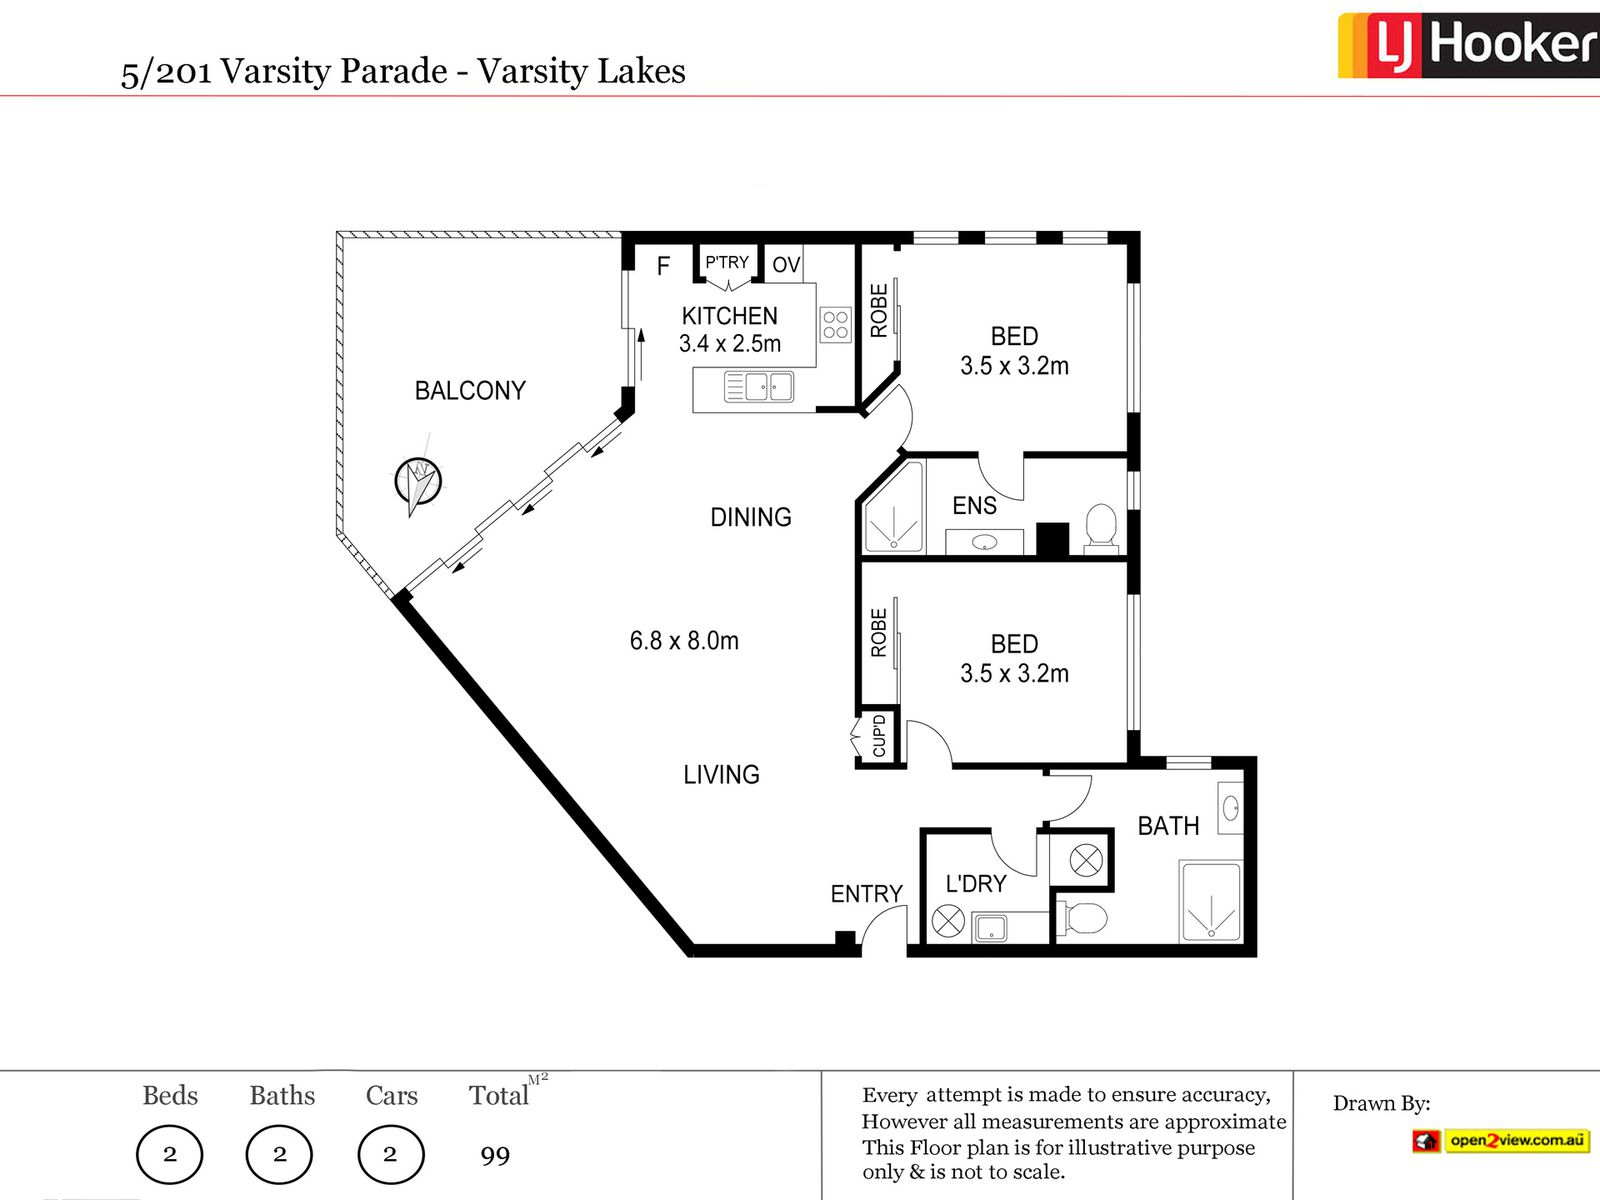 U5 / Market Square Varsity Parade, Varsity Lakes